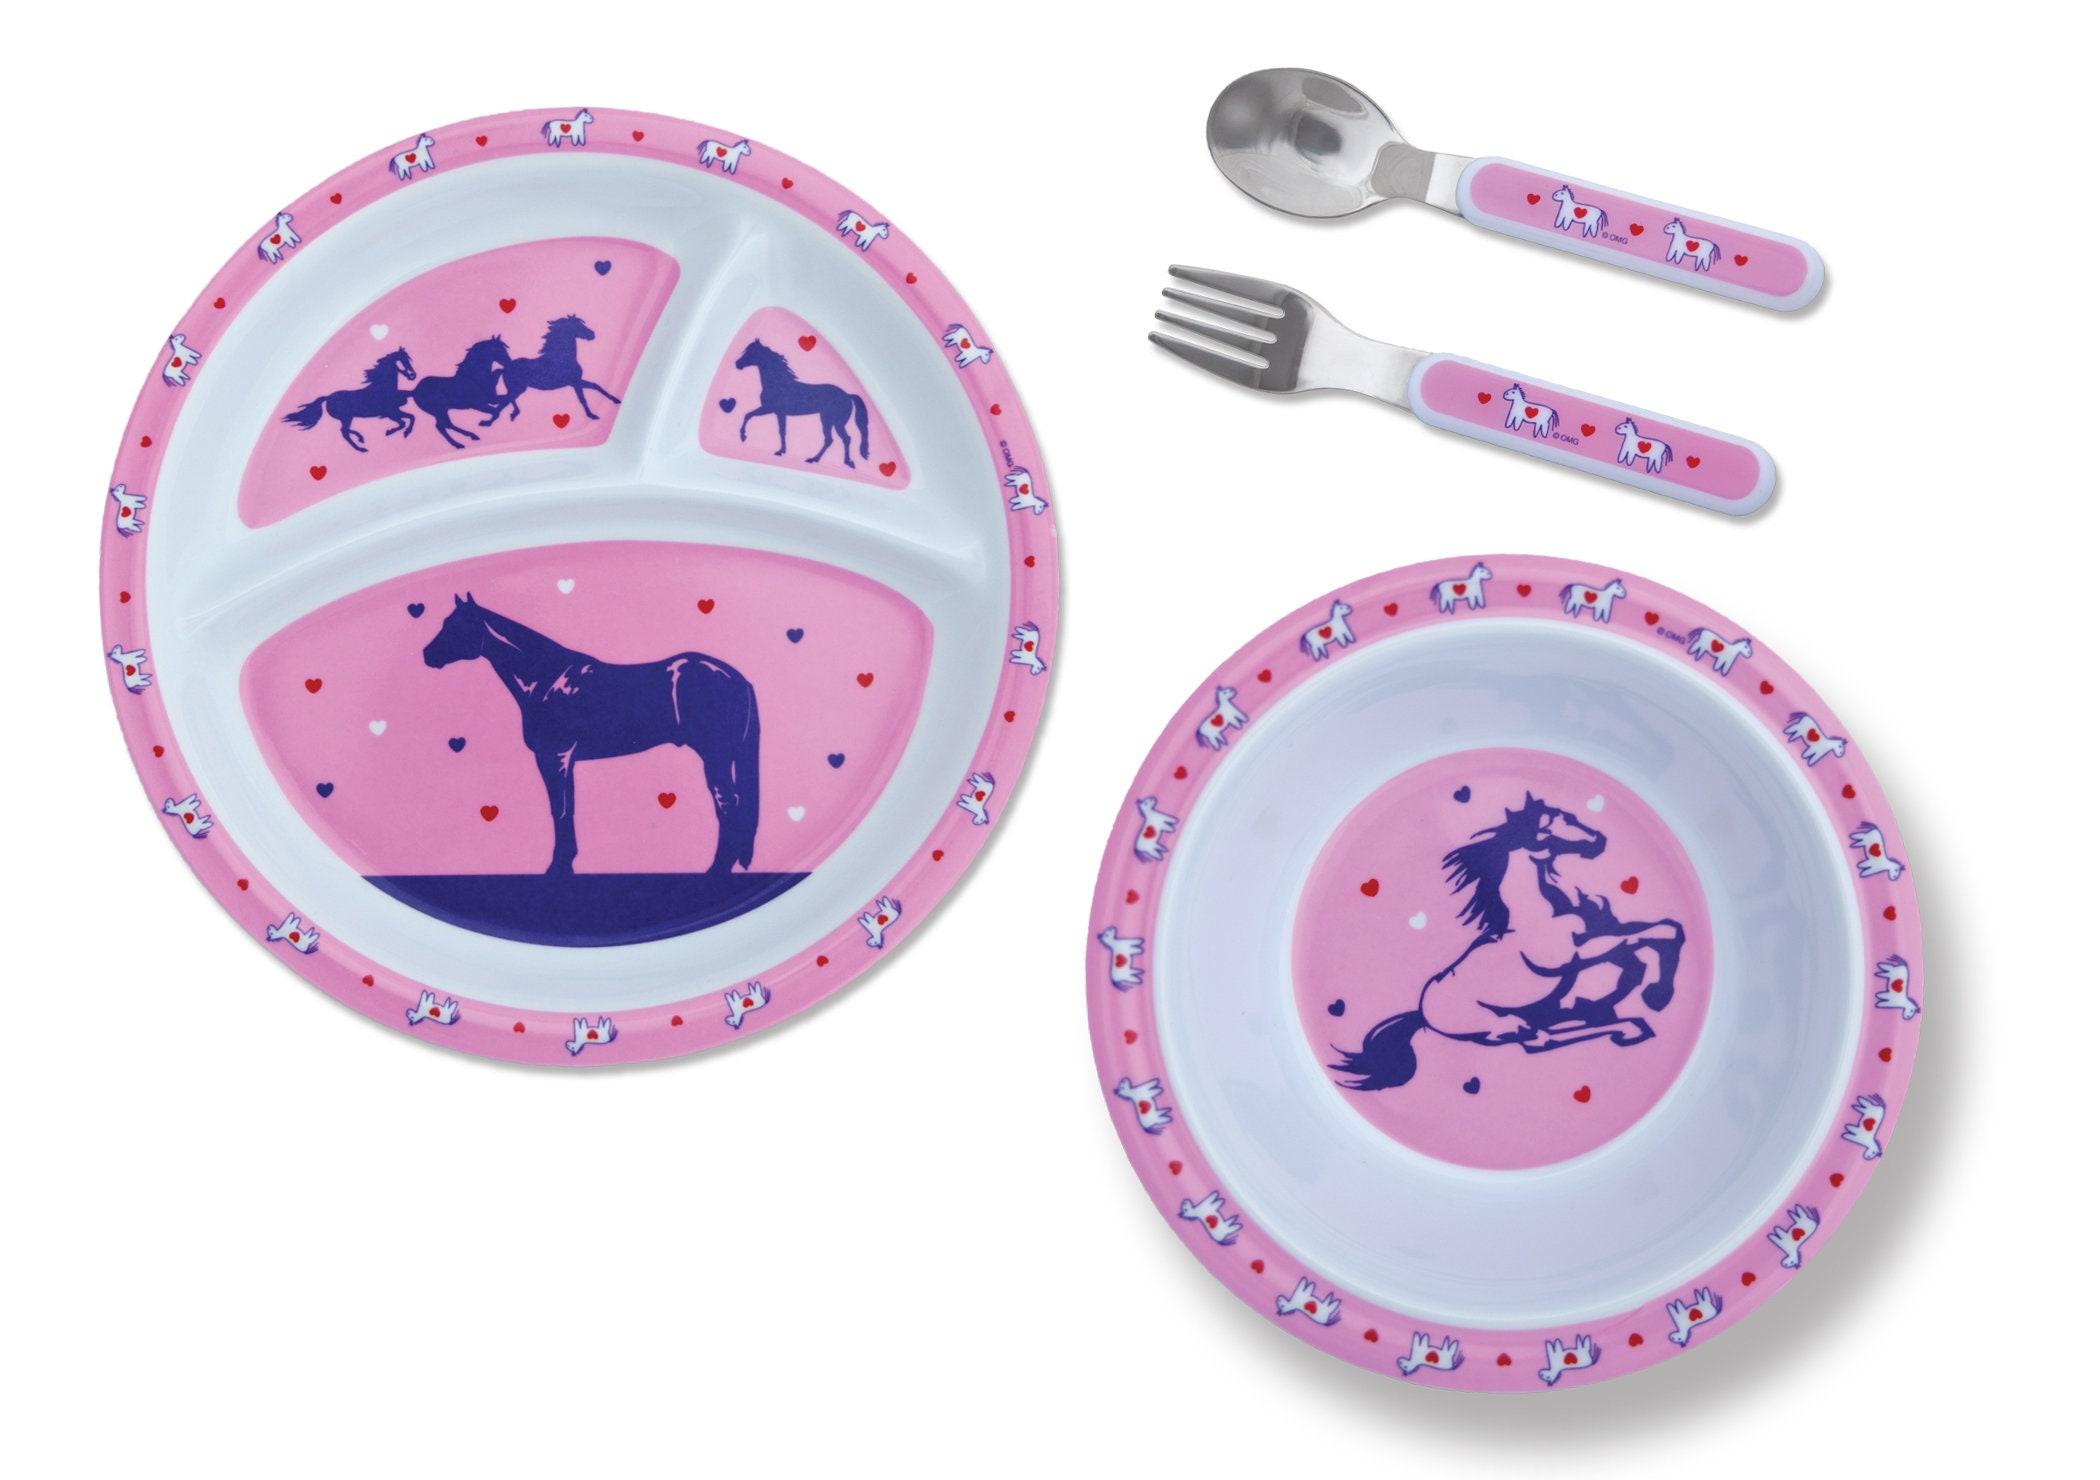 4 pc horse or cowboy Kids Dinnerware gift set